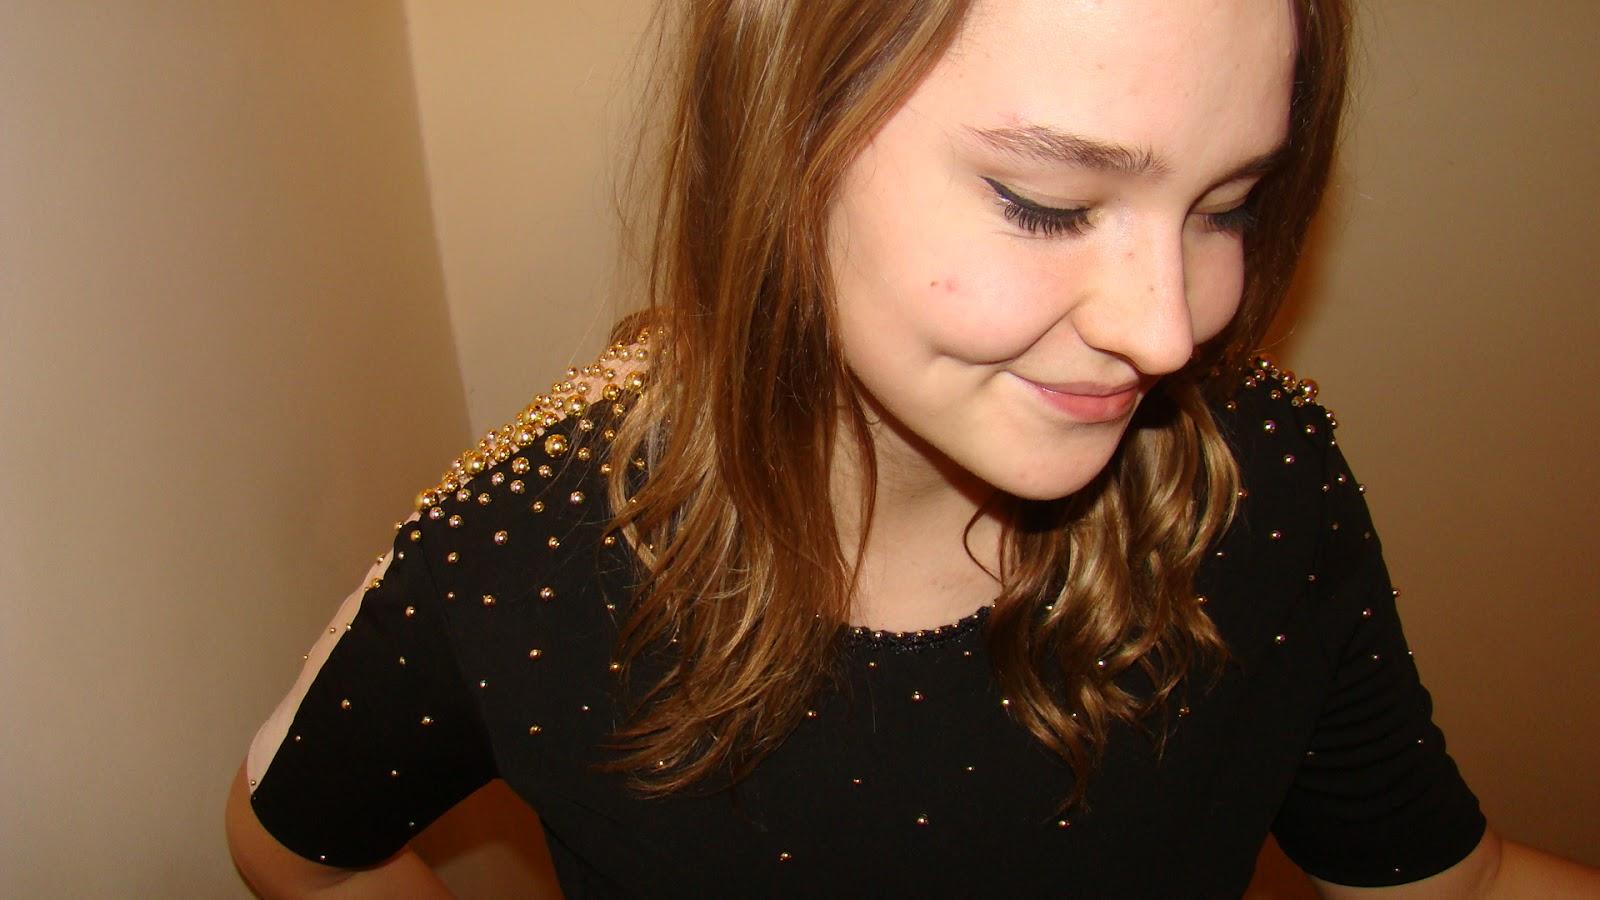 sukienka na studniówkę 2013